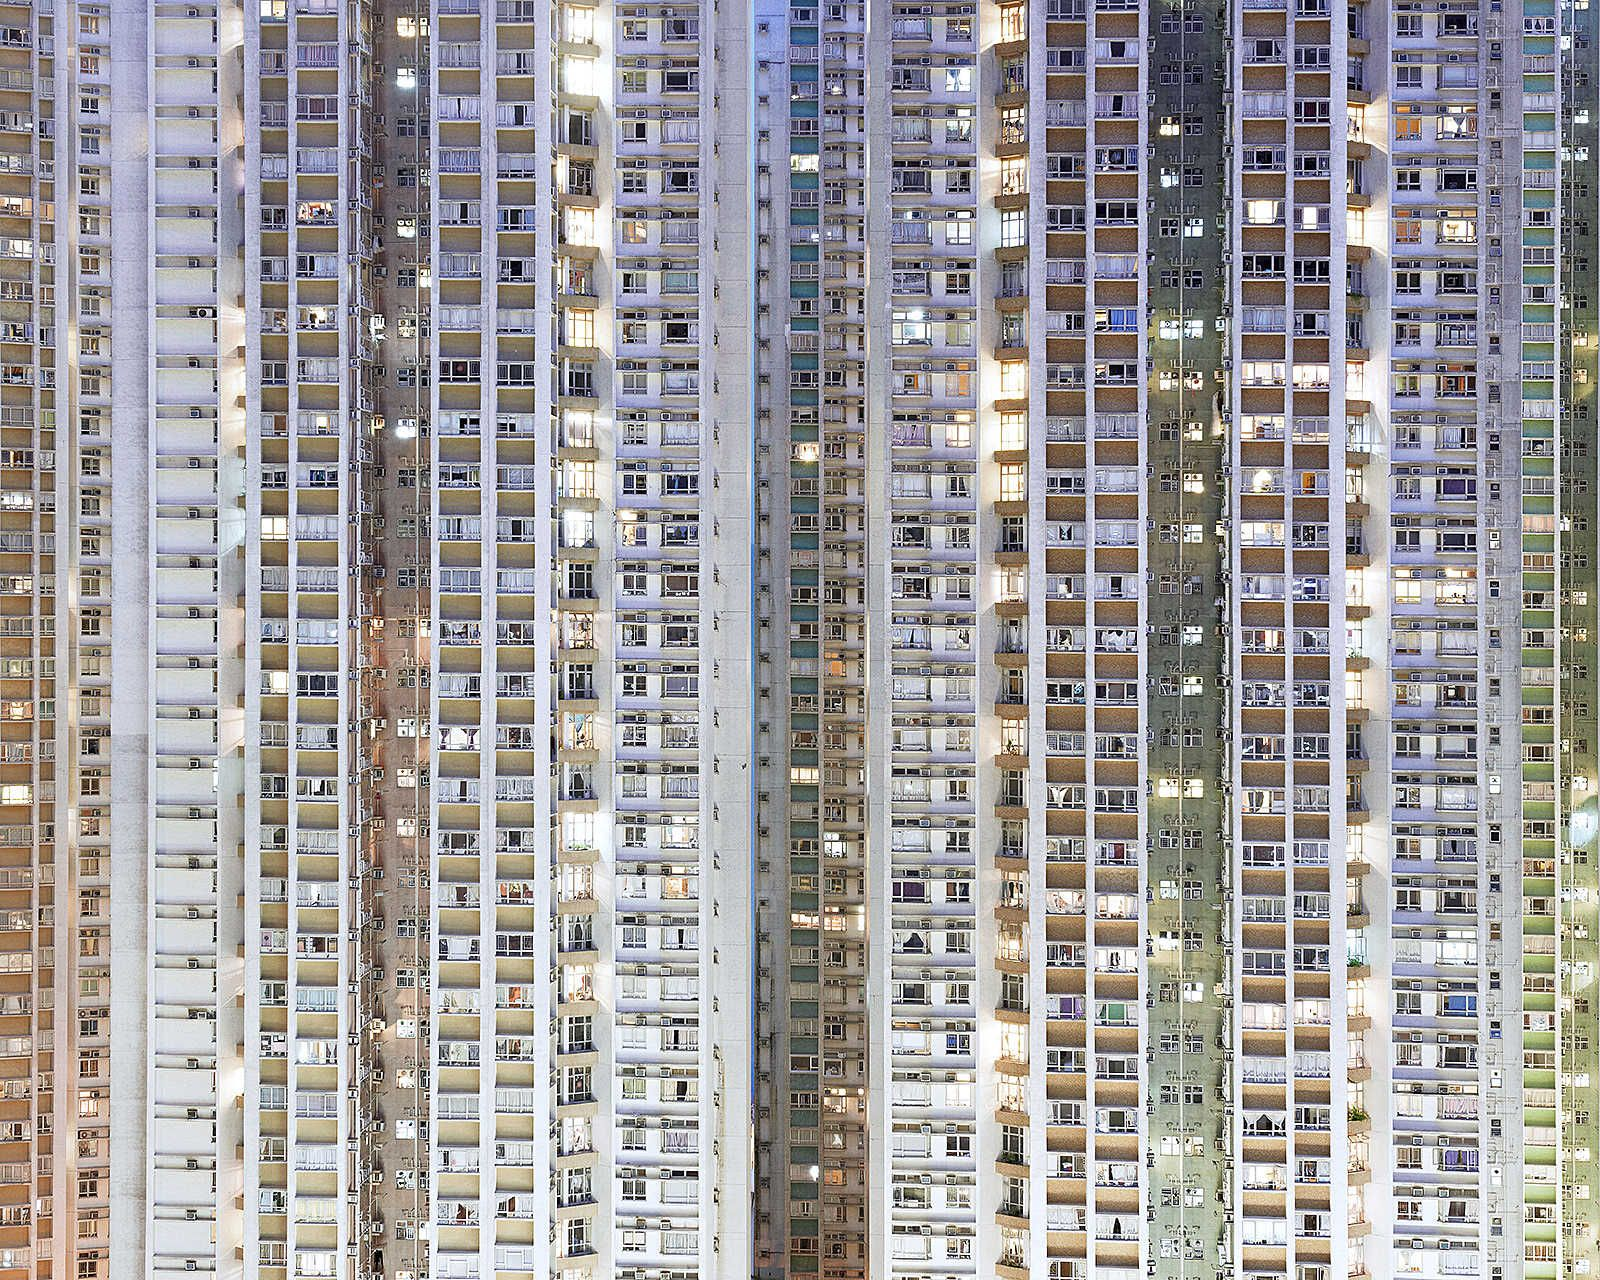 Urban landscape V - Bence Bakonyi - Schilderijen, fotografie, fotokunst online bij LUMAS